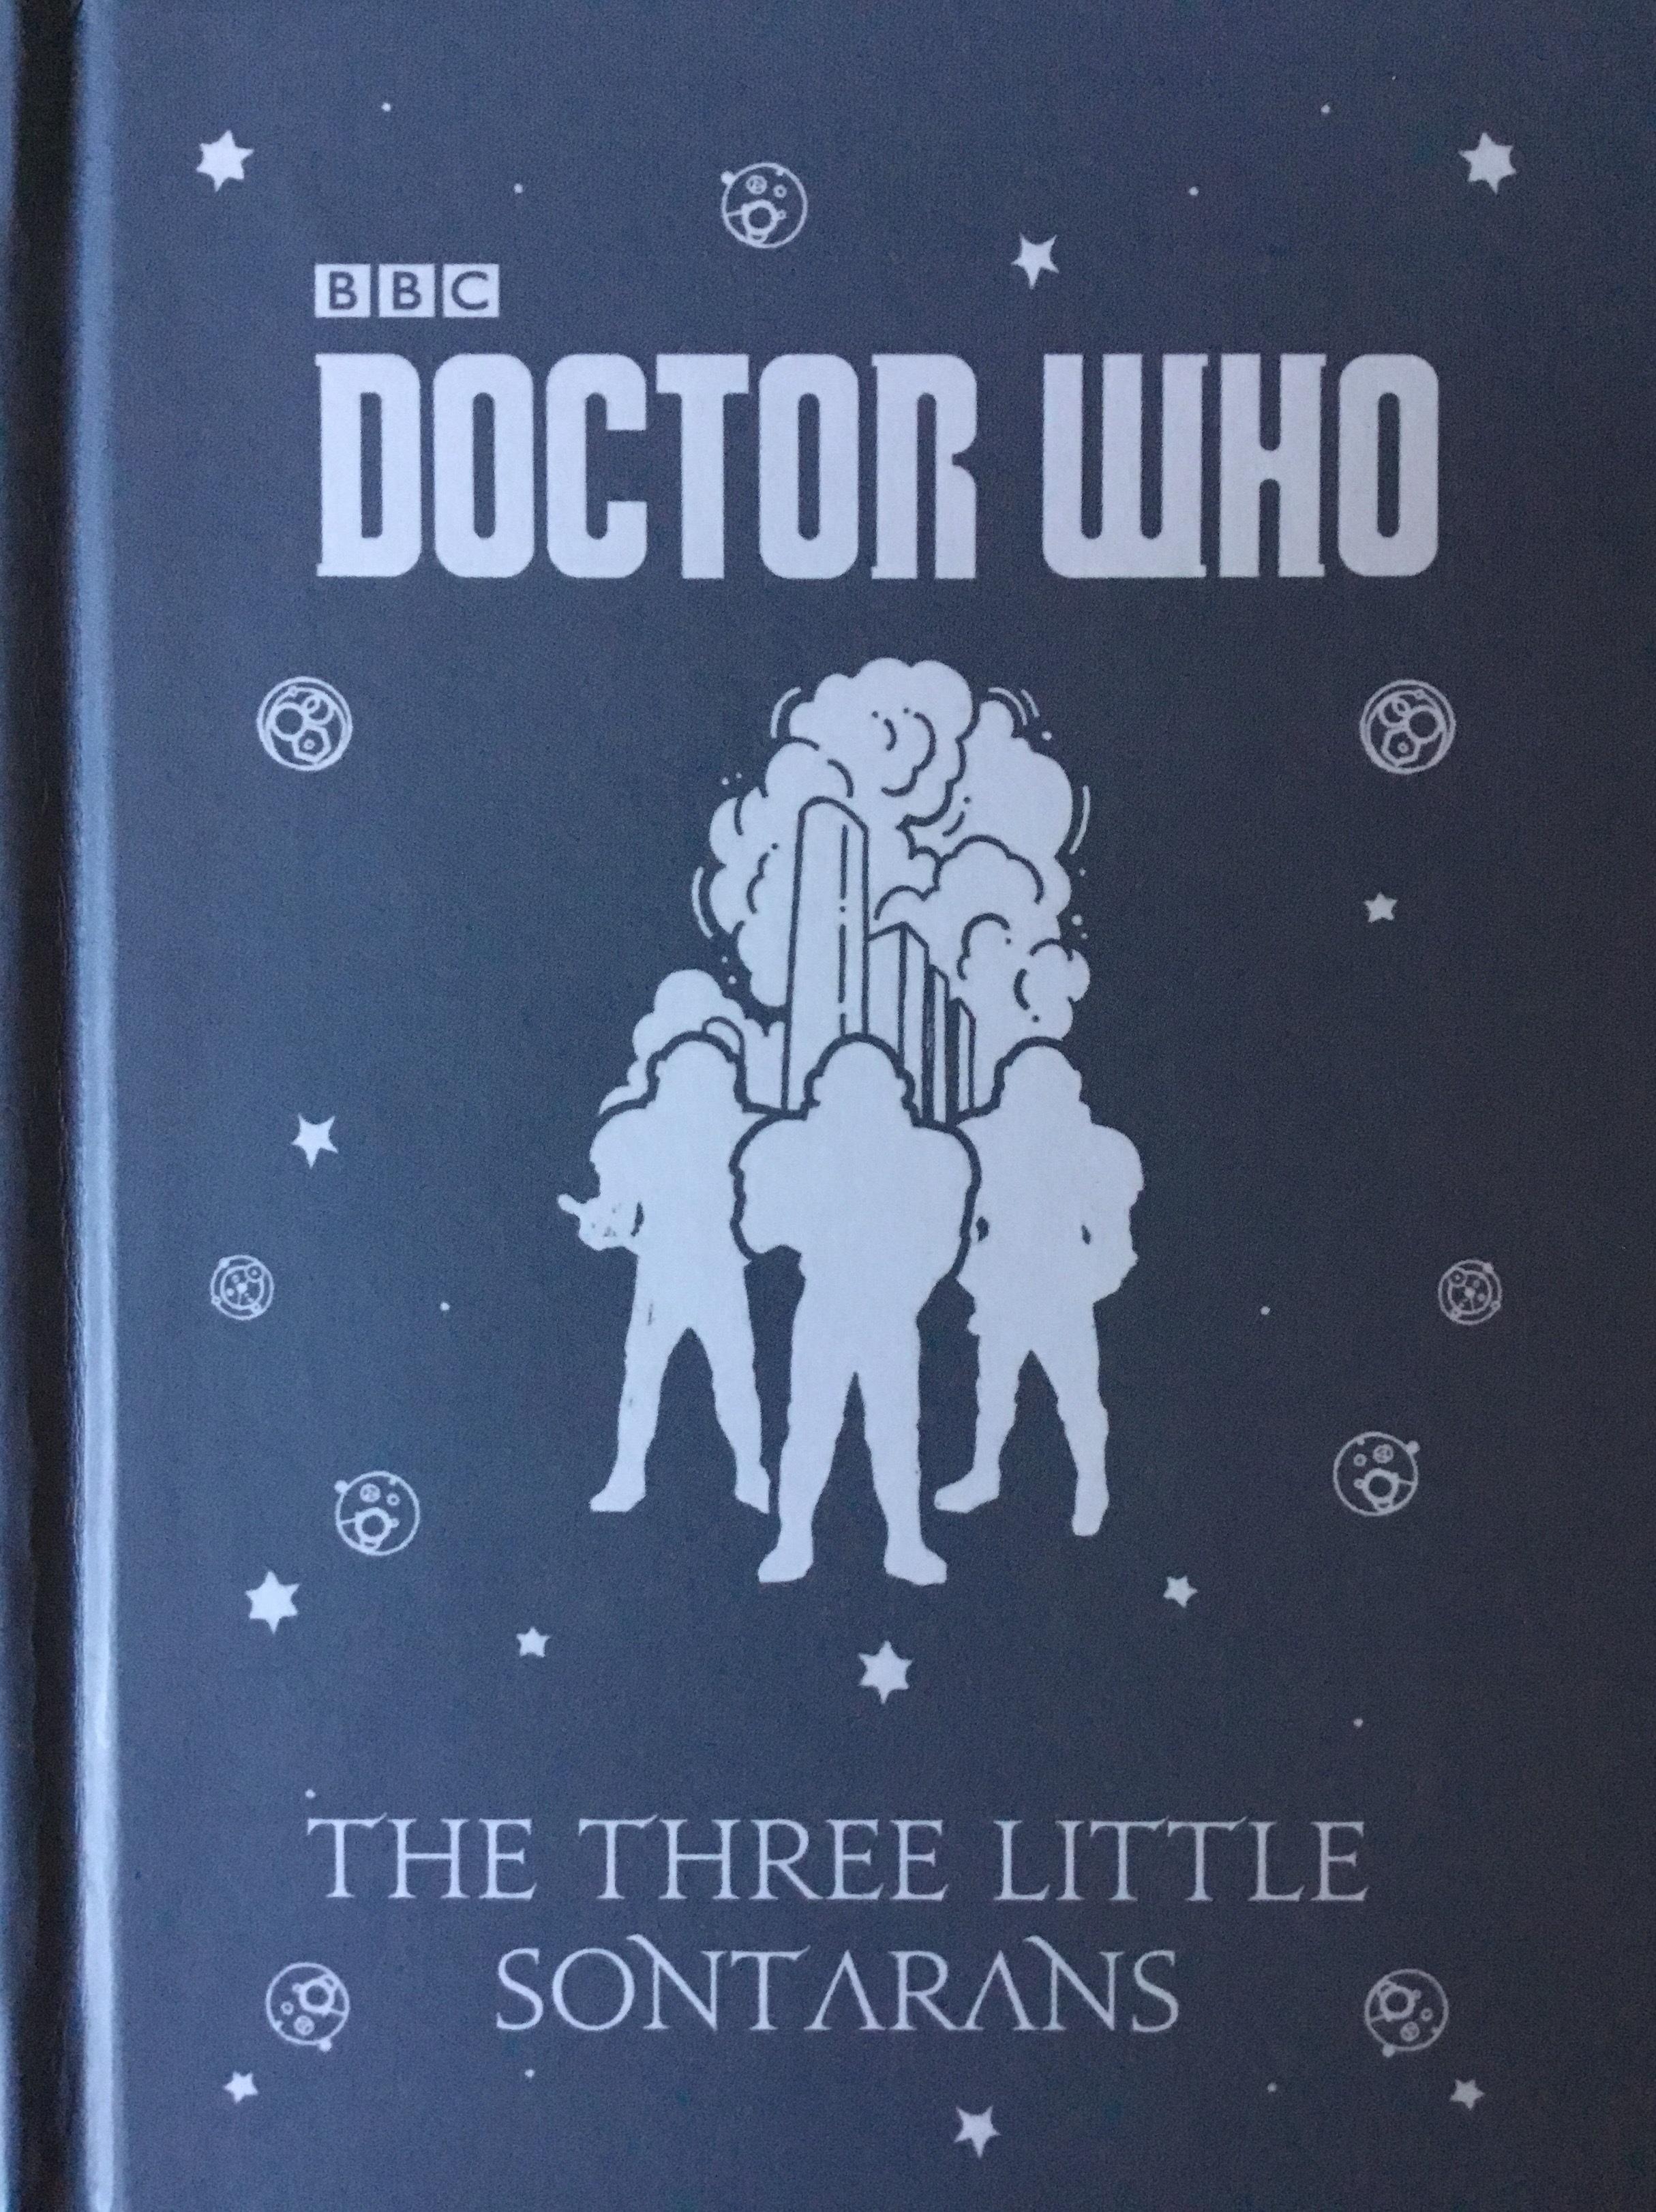 The Three Little Sontarans